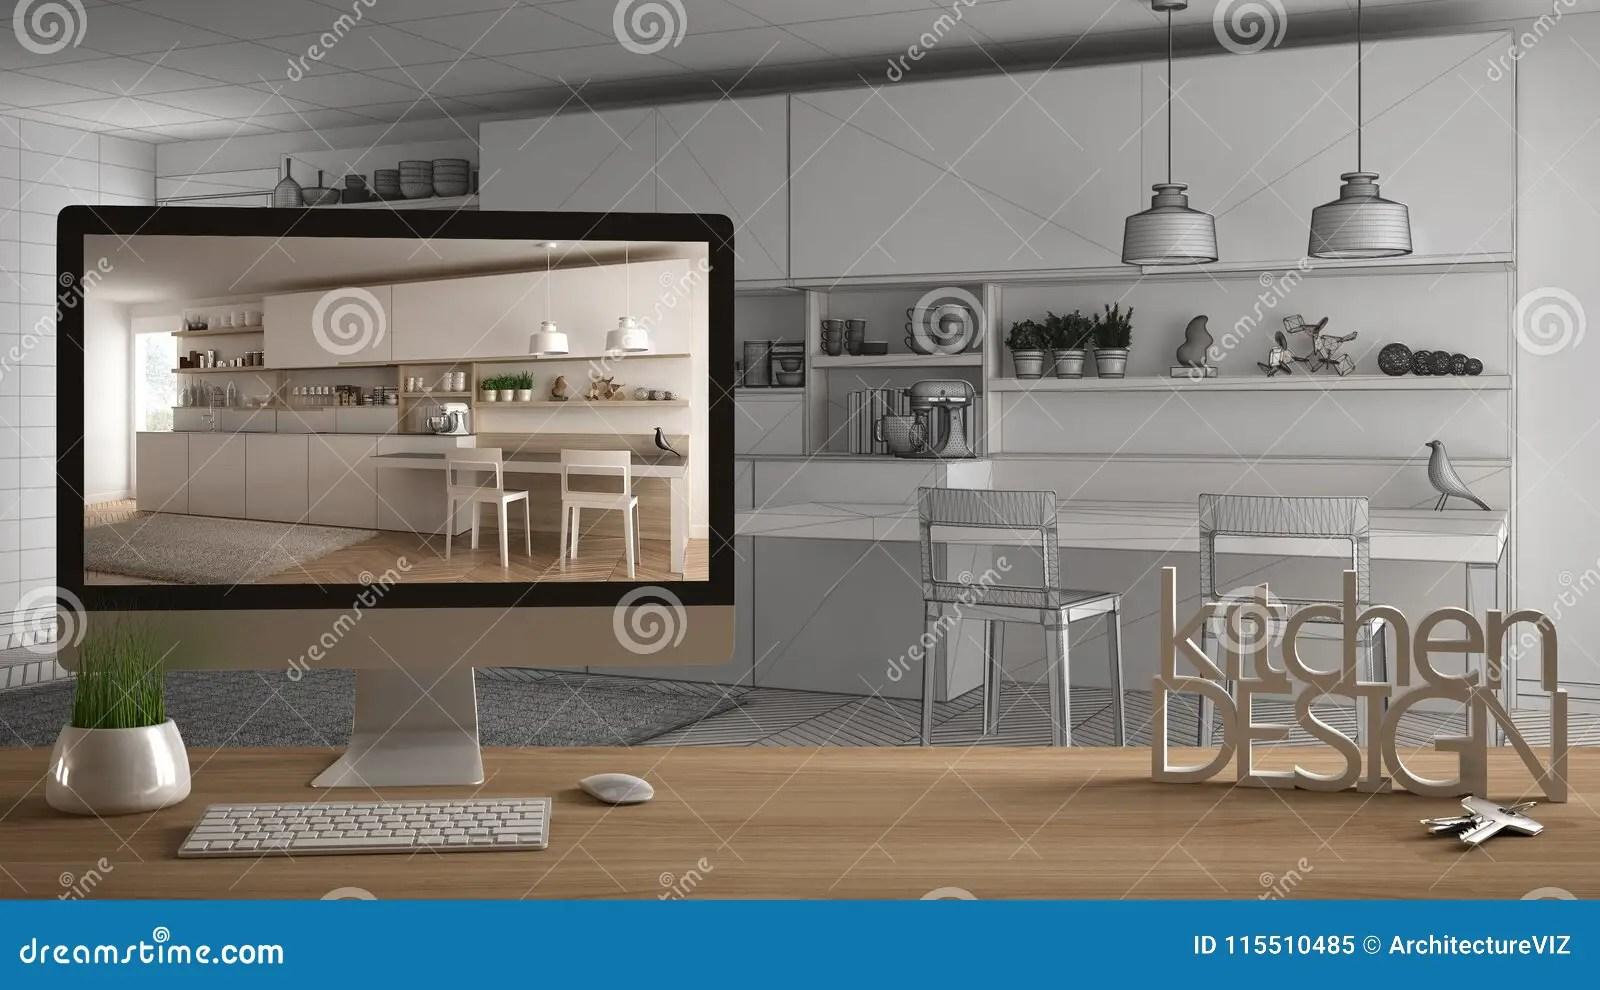 kitchen designer stand alone cabinets 建筑师设计师项目概念 与房子钥匙 3d信件词厨房设计的木桌和桌面显示的 3d信件词厨房设计